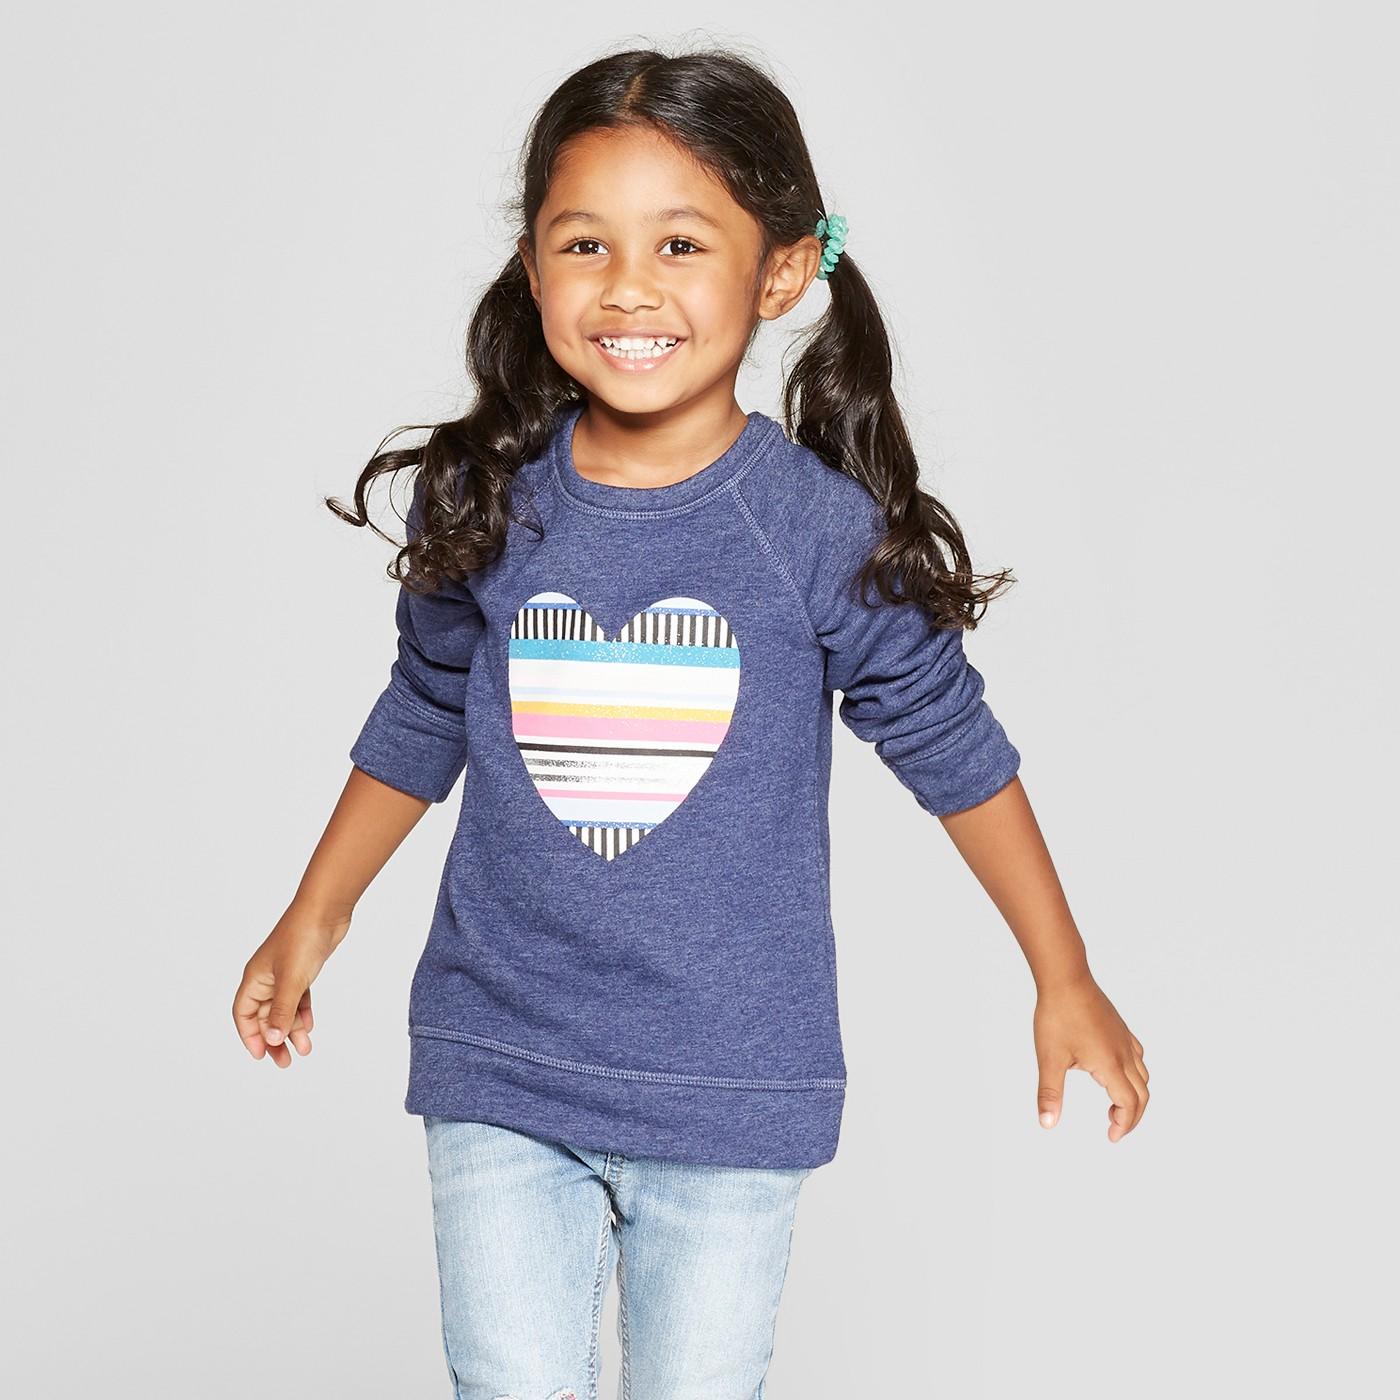 Toddler Girls' Heart Sweatshirt - Cat & Jack™ Navy - image 1 of 3